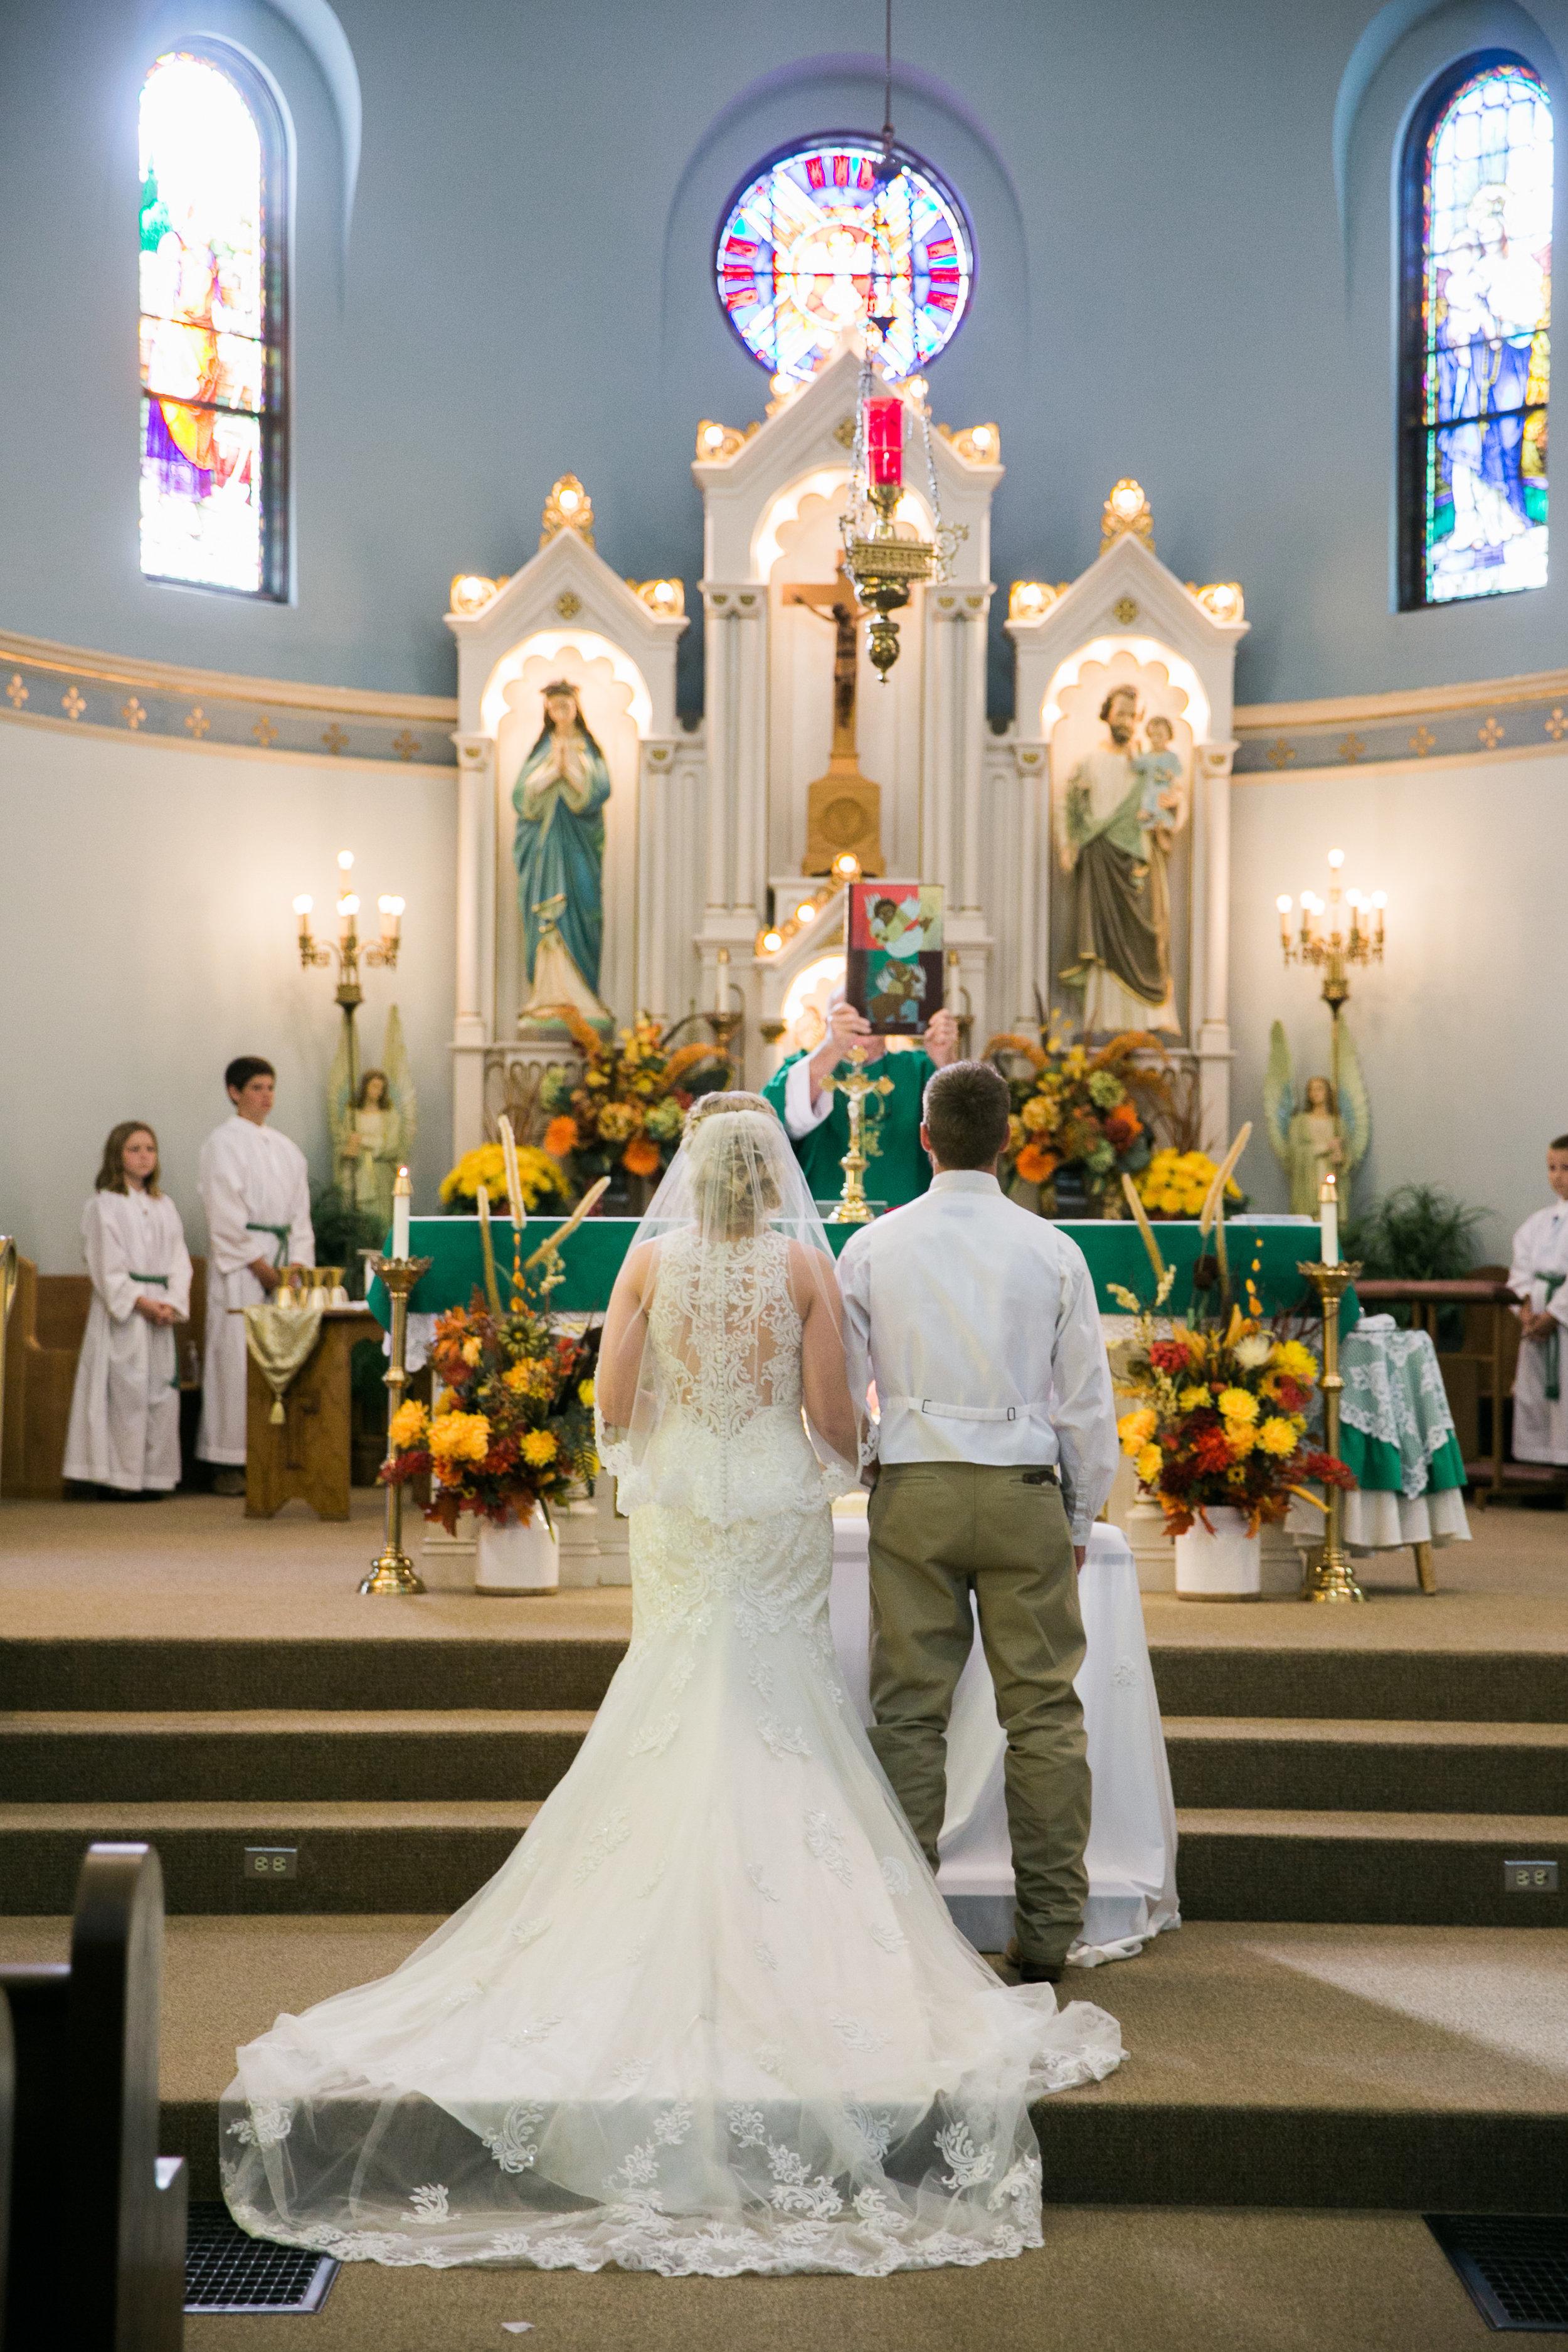 Bailey-Nathan-Windthorst-Texas-Wedding-037.jpg